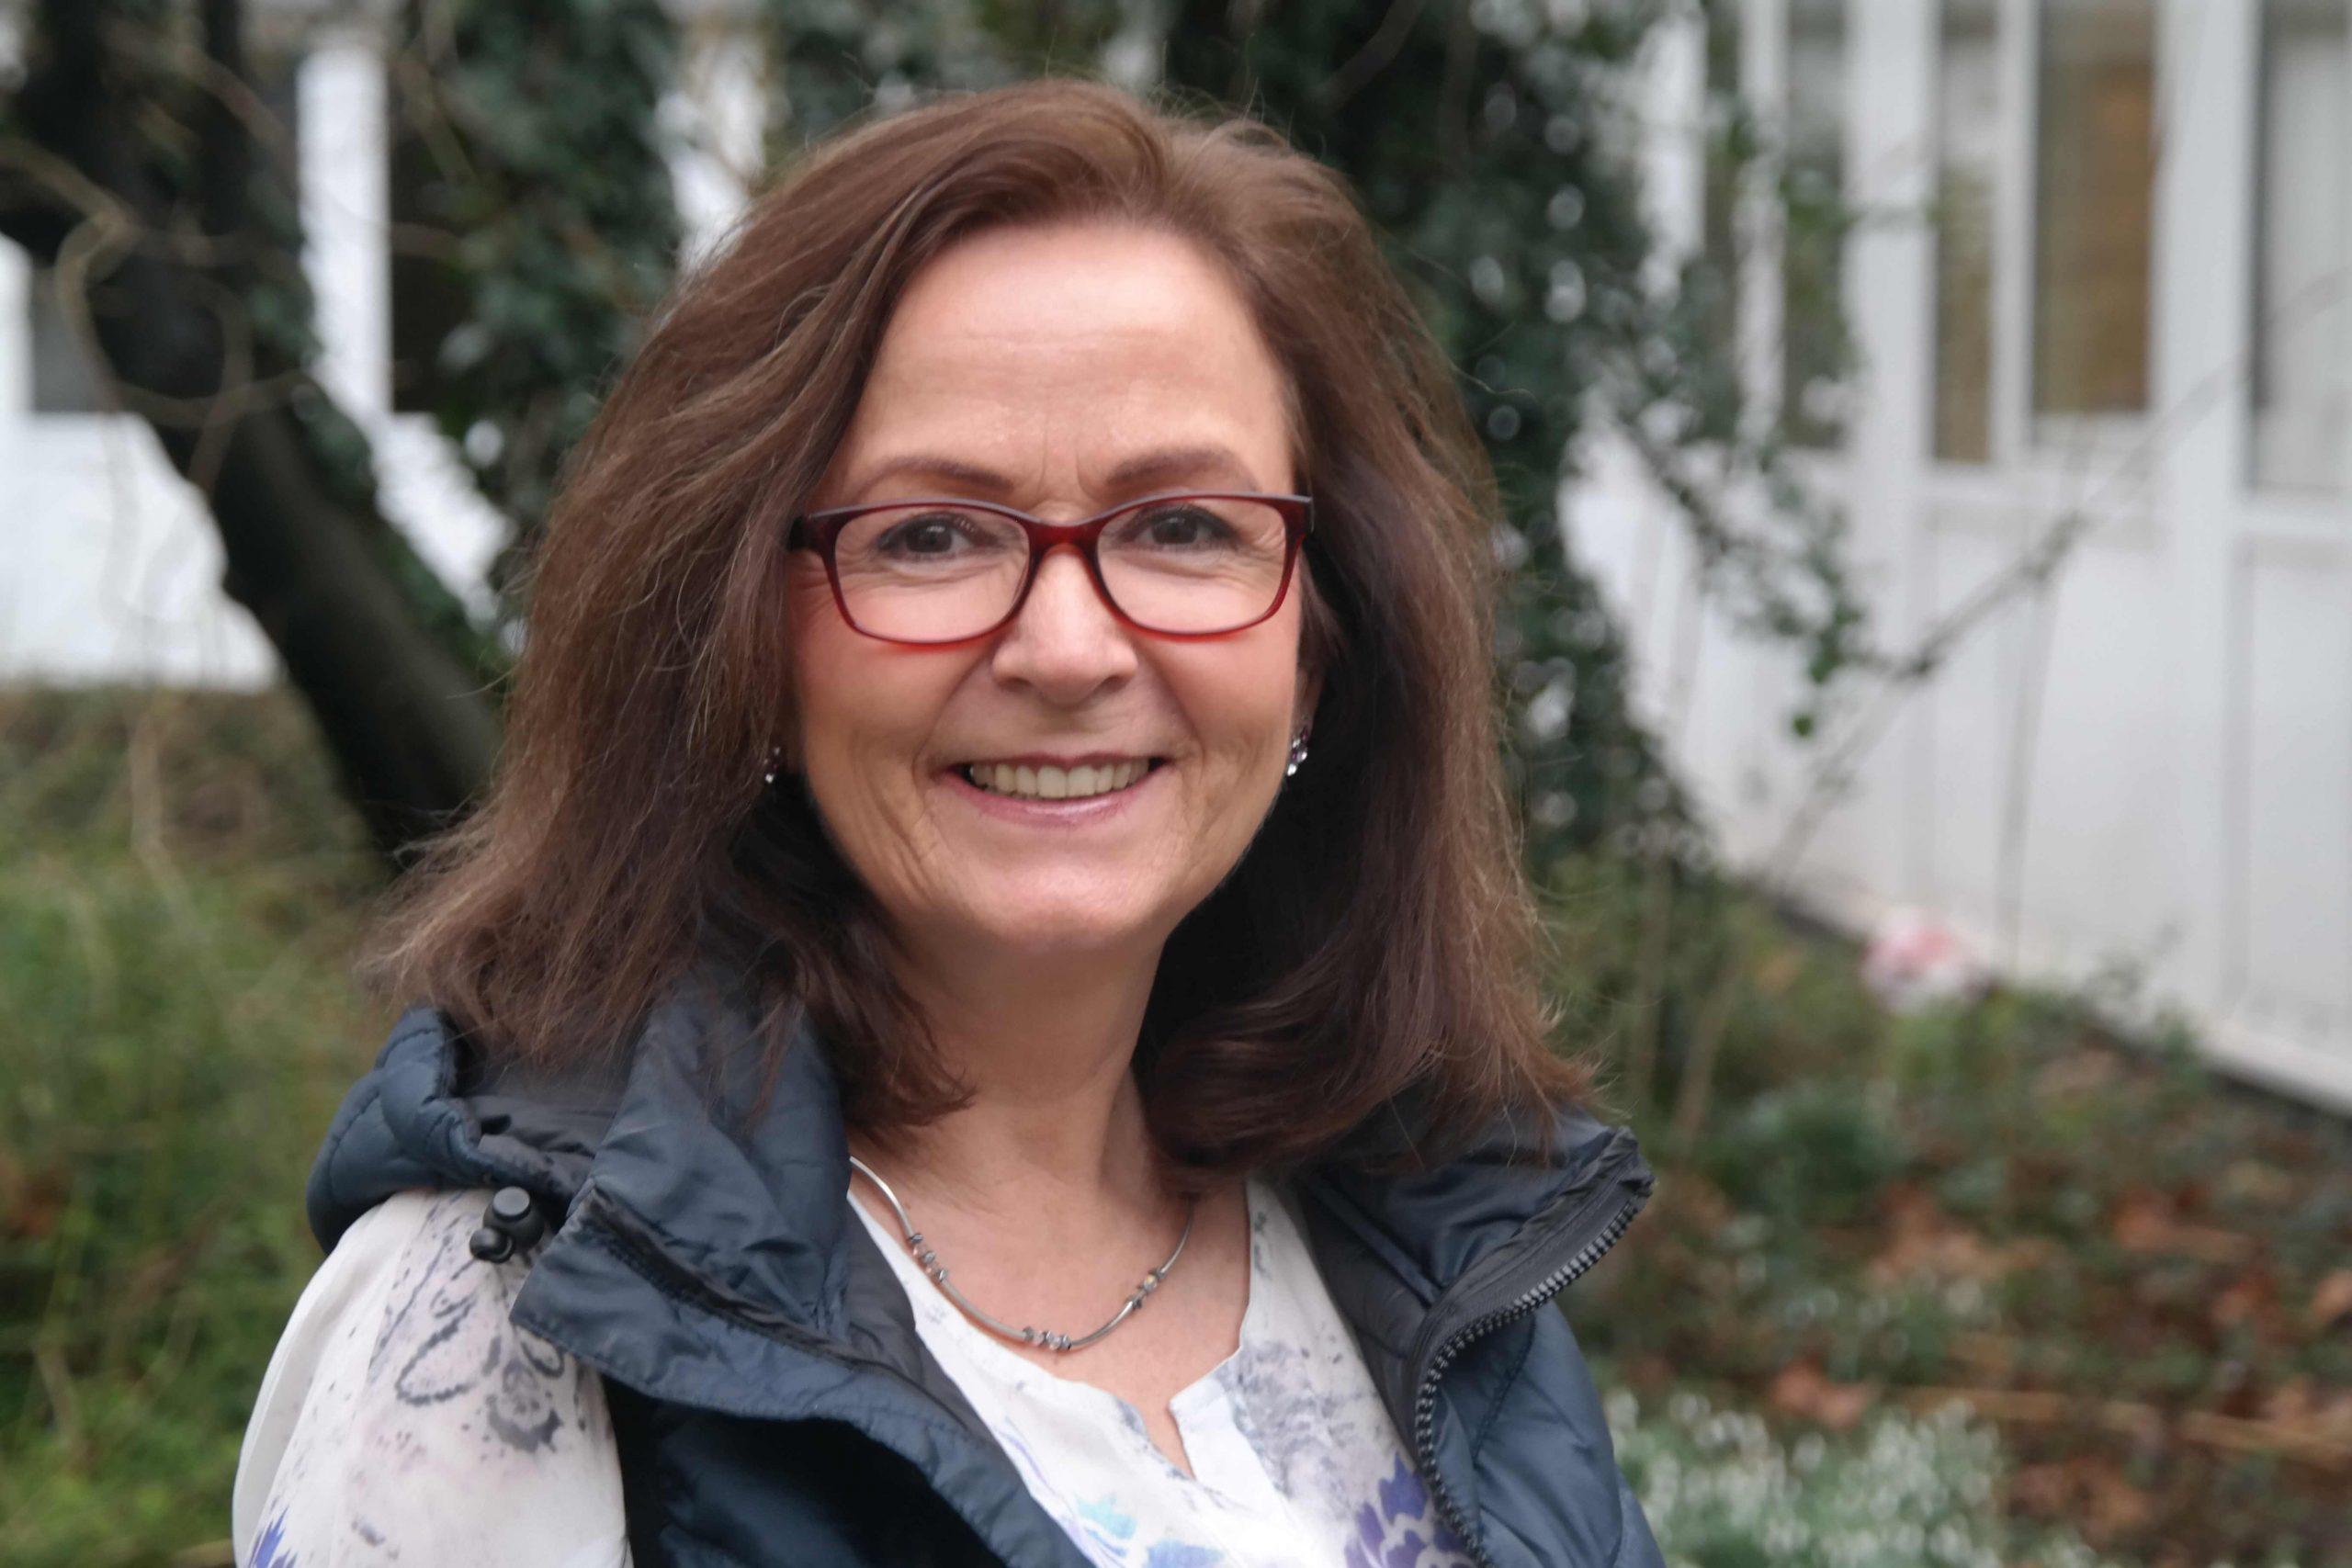 Frau Isenberg